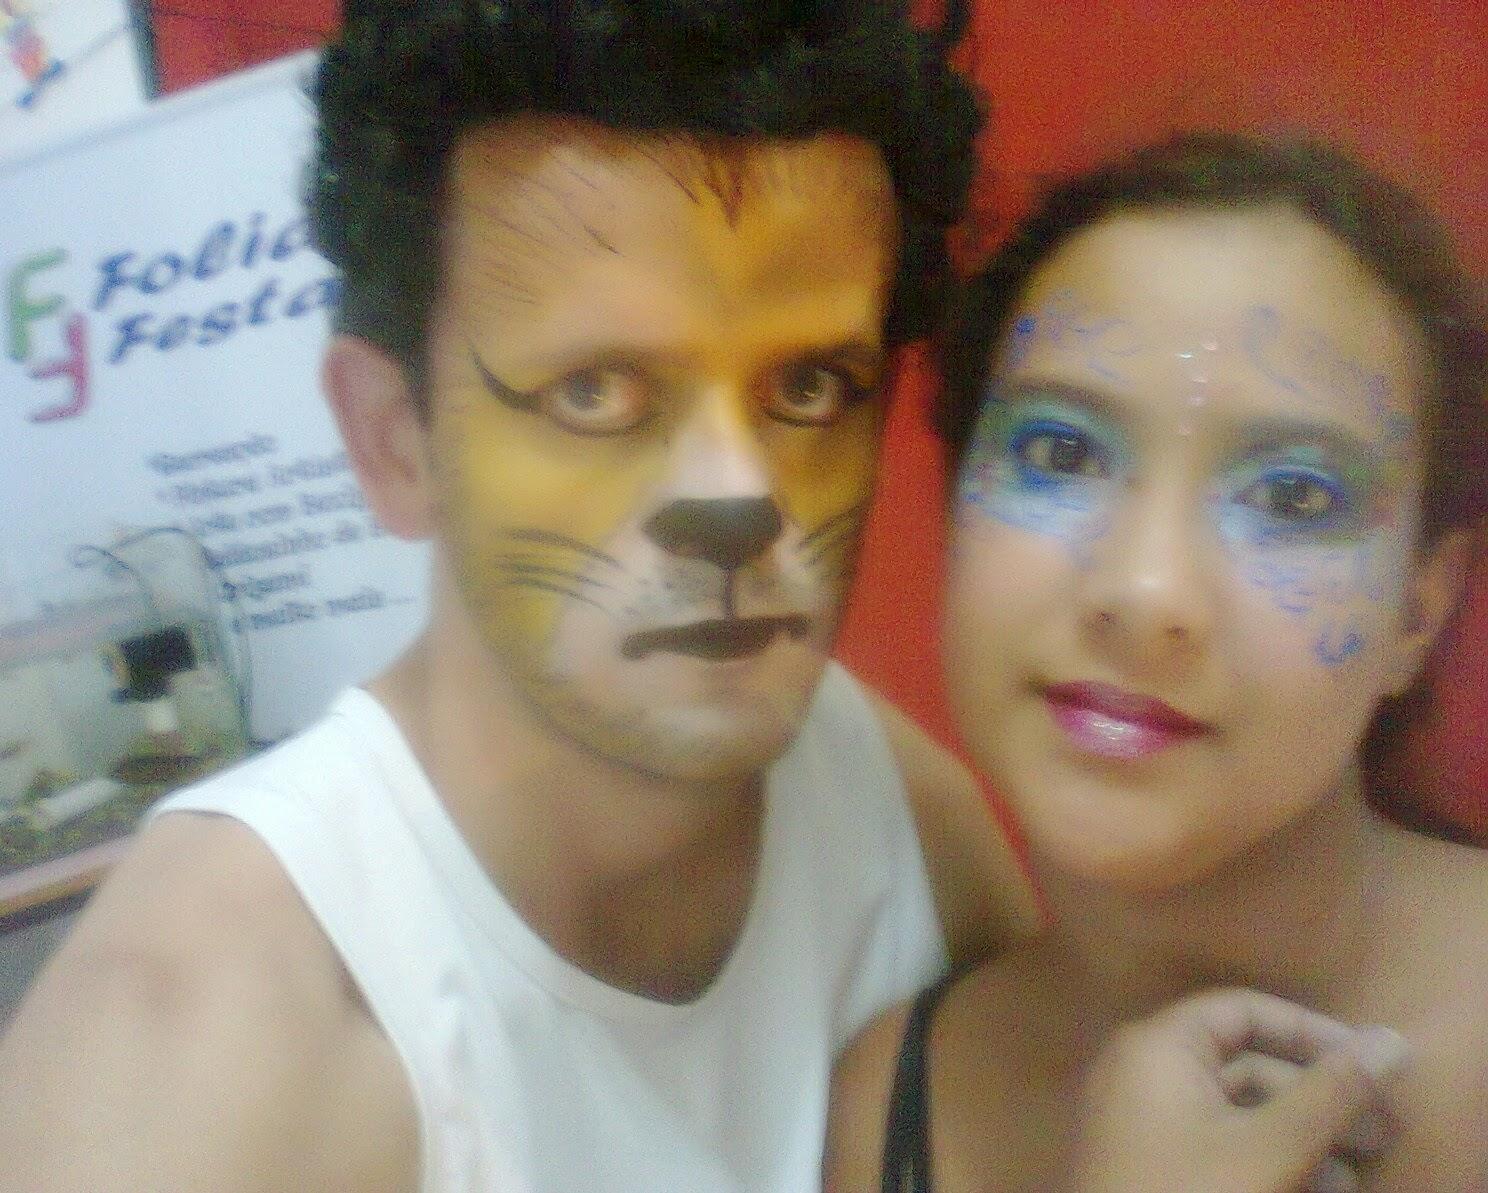 pintura facial Leão e Princesa